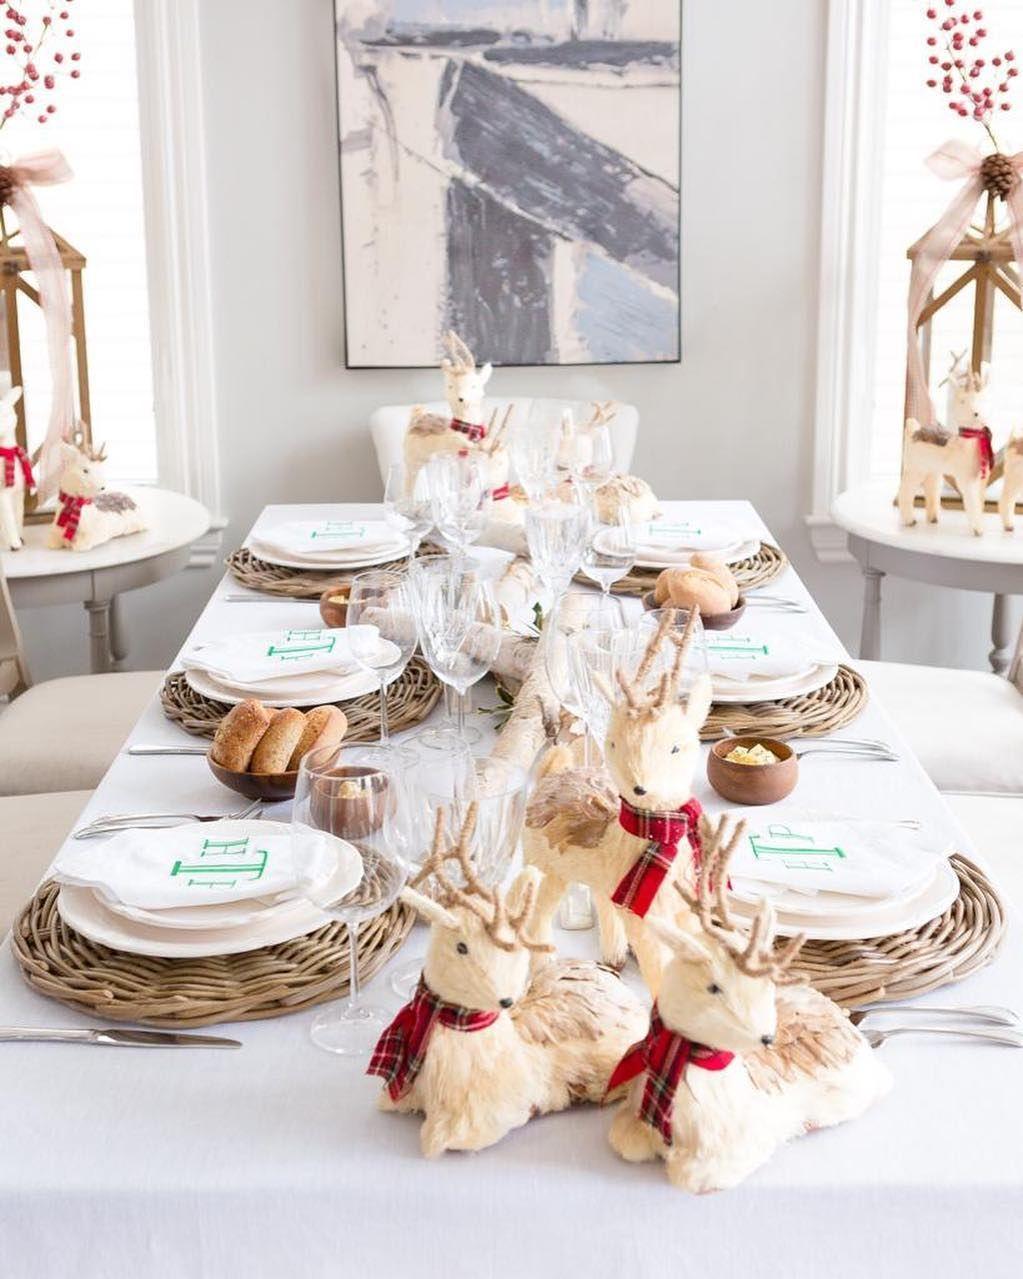 Little Reindeer Christmas Tablescape via @marialeticiaphotos